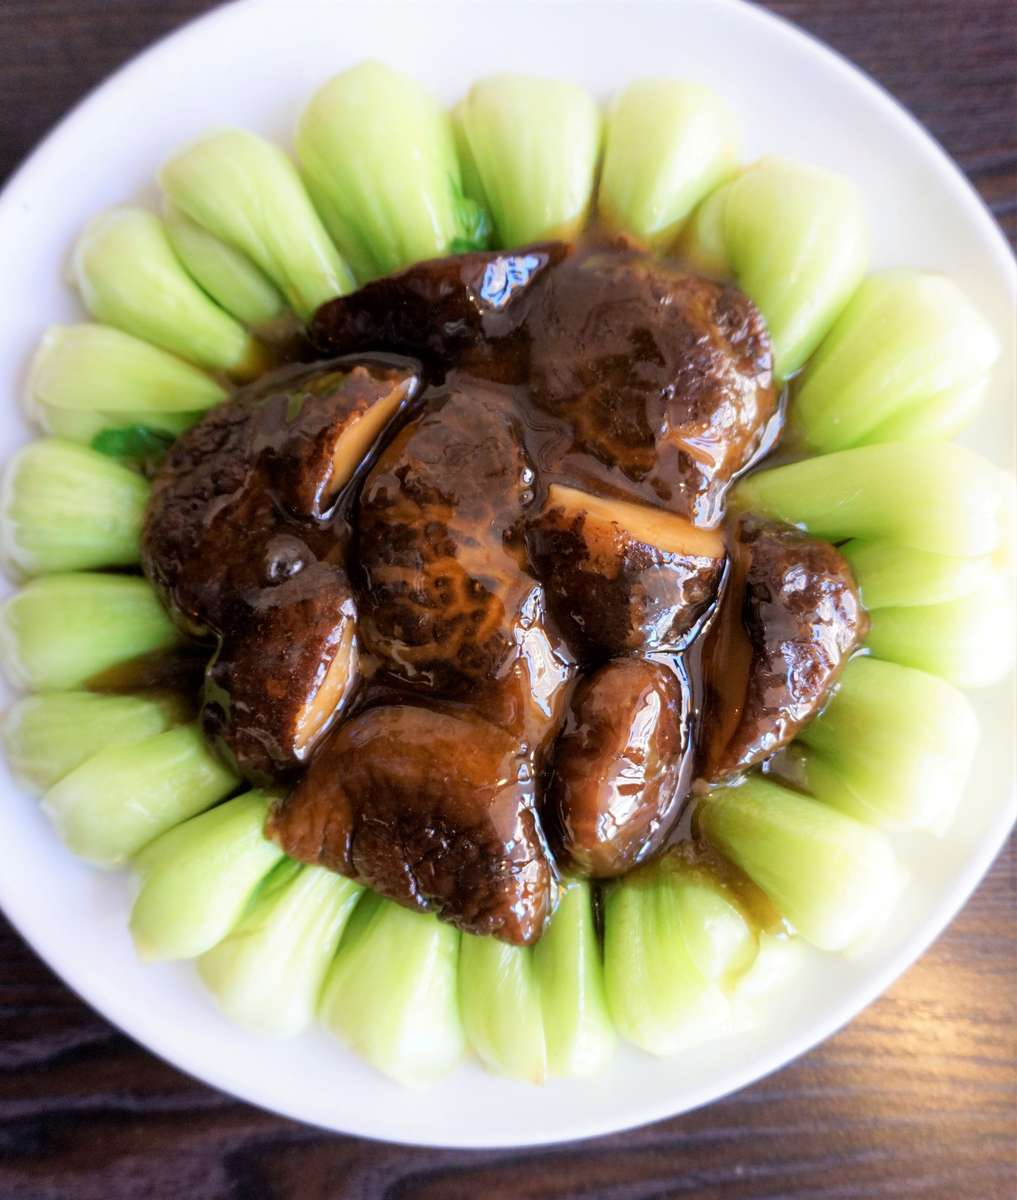 Braised Mushroom and Bok Choy 香菇青菜